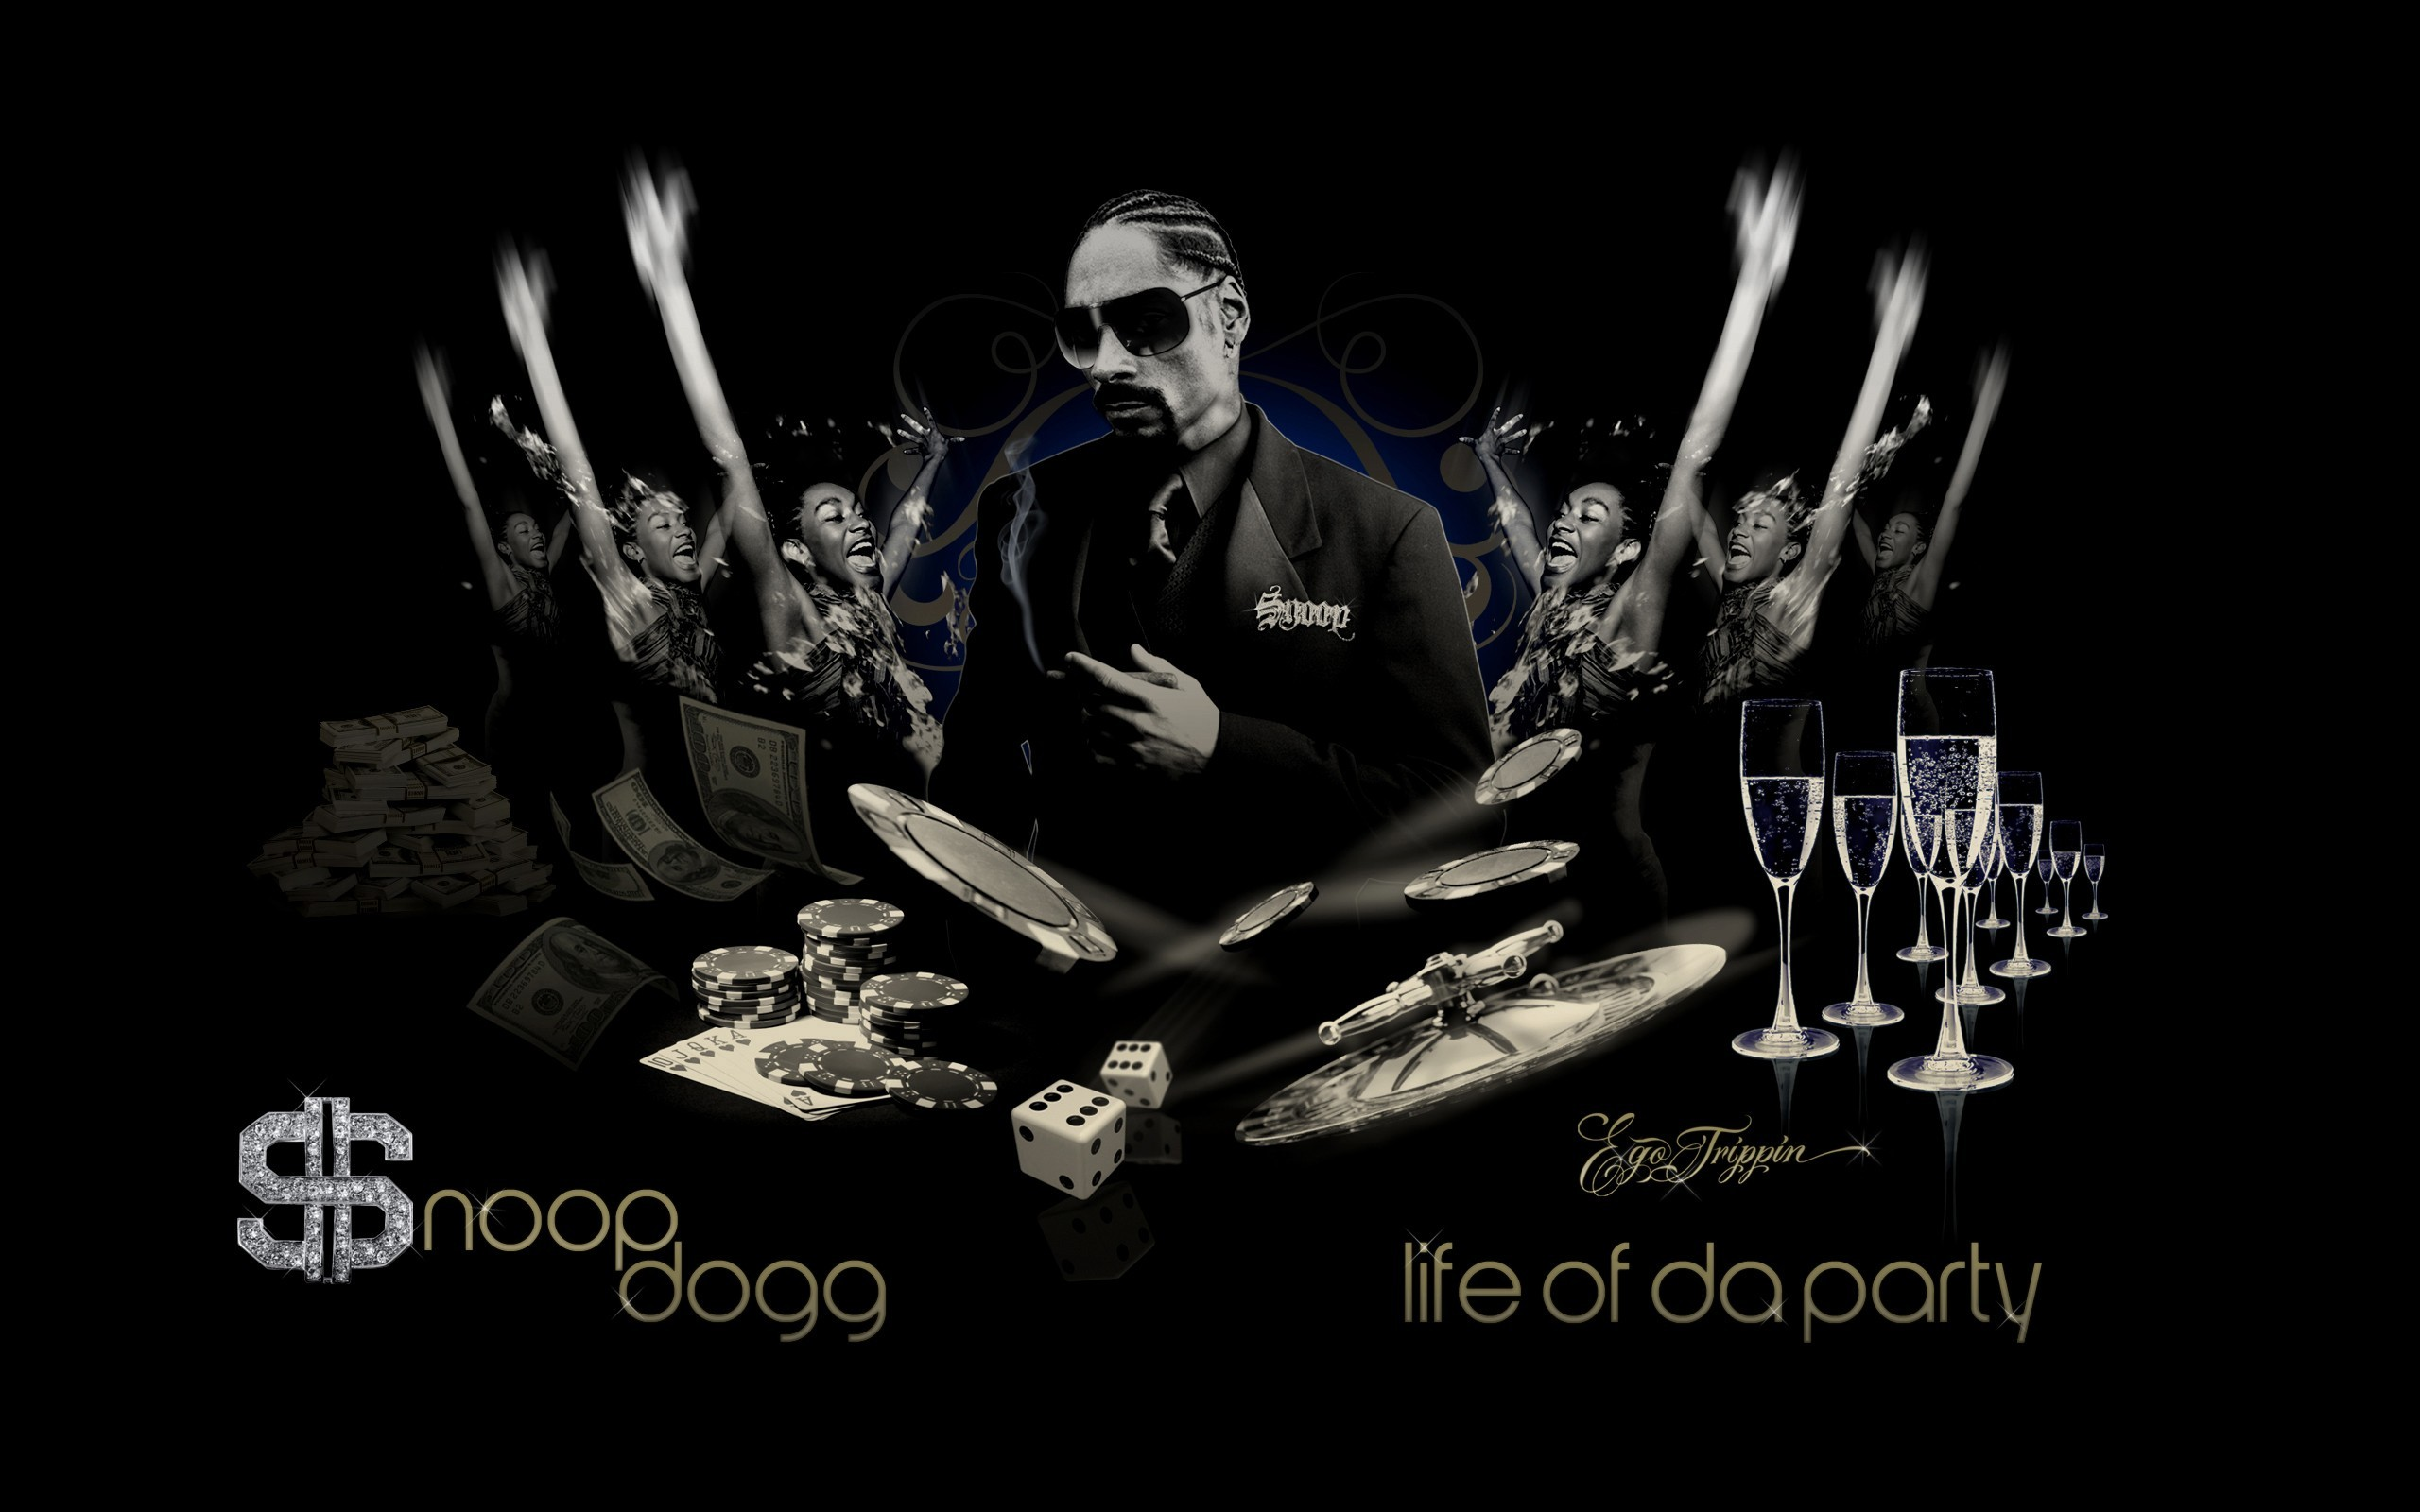 Dogg Wallpapers, Free Gangsta Life Snoop Dogg HD Wallpapers, Gangsta .